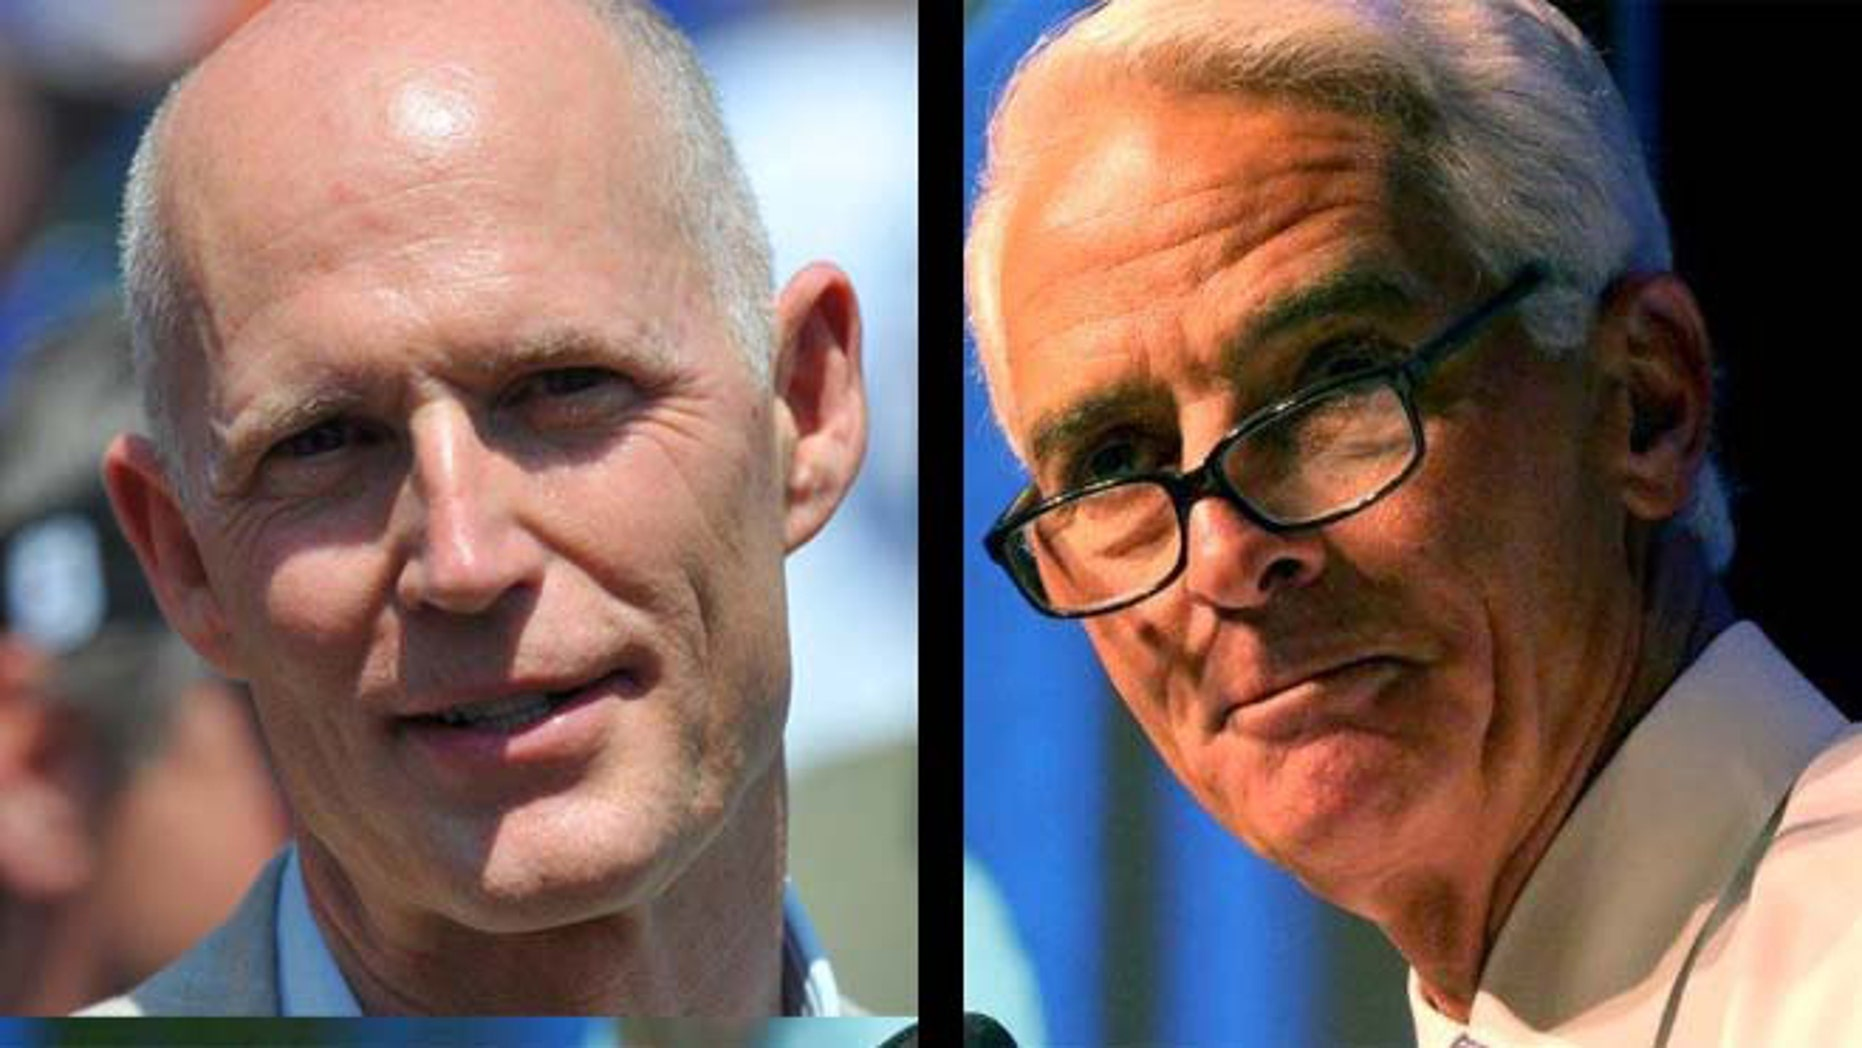 Florida Gov. Rick Scott, Republican, left; Democratic challenger Charlie Crist, right